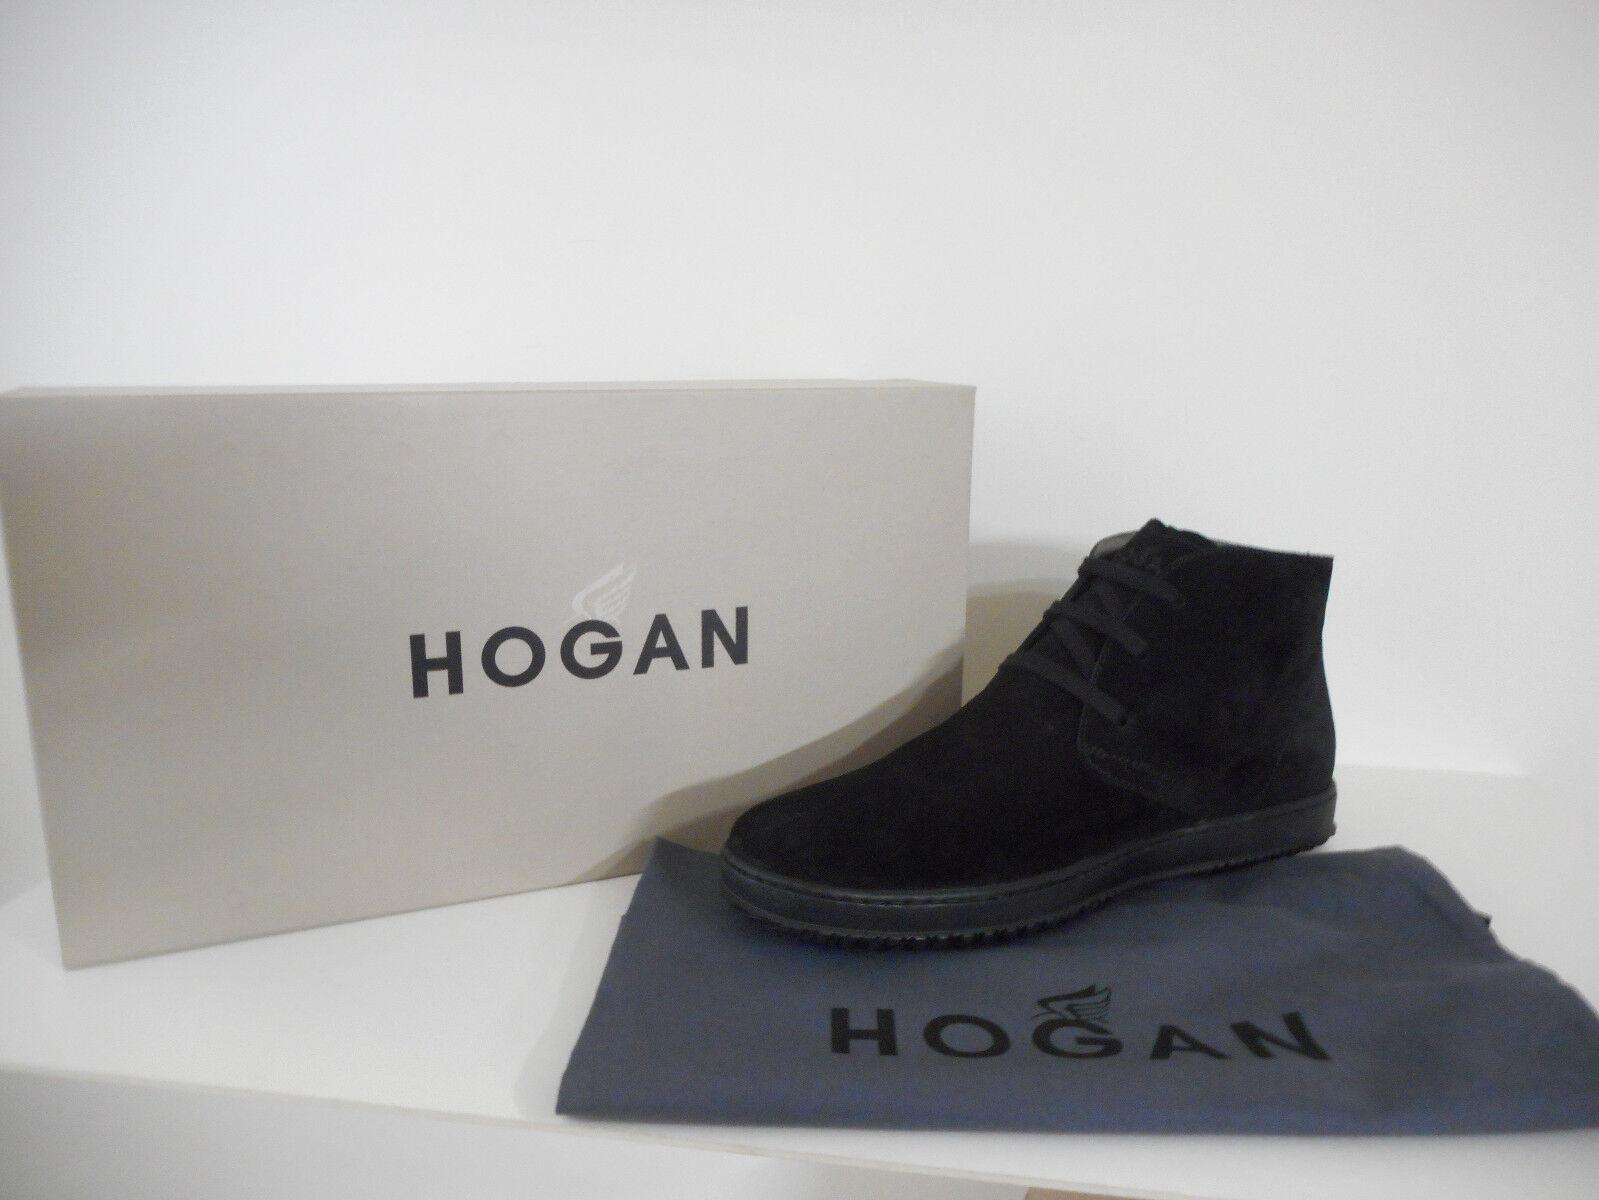 Scarpa Uomo Hogan - . .Sconto - Hogan 50%.Art AXM1490985OHG0C401.Col.Nero 03b7d2